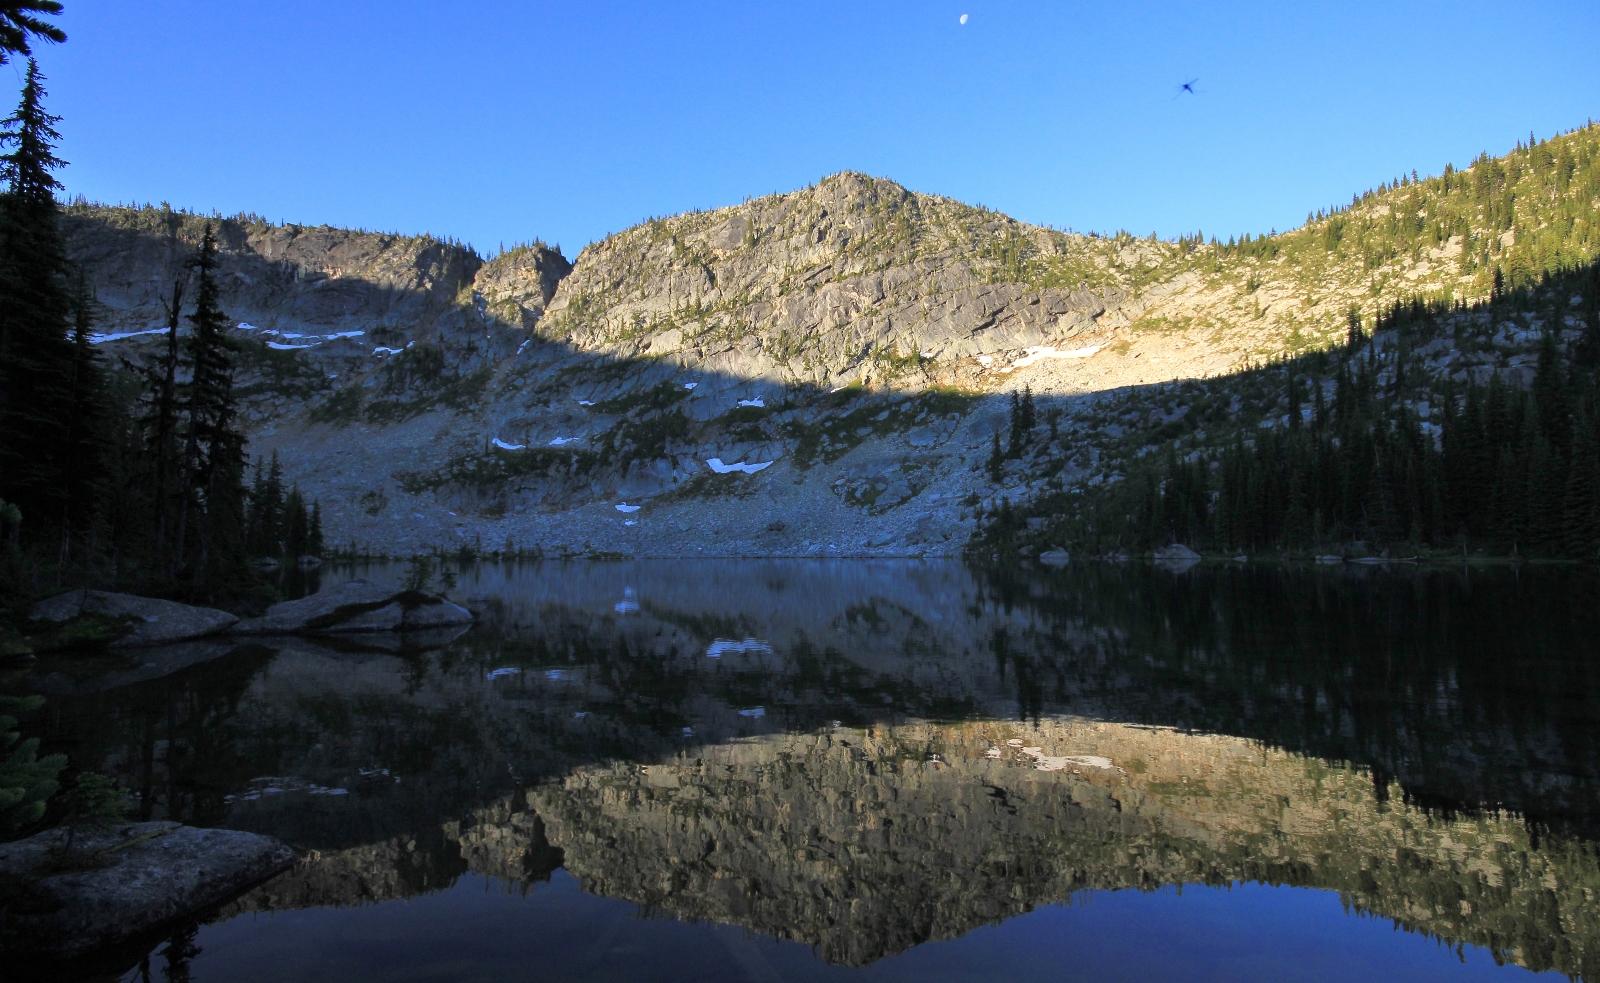 07-24-16-big-fisher-lake-bp-13